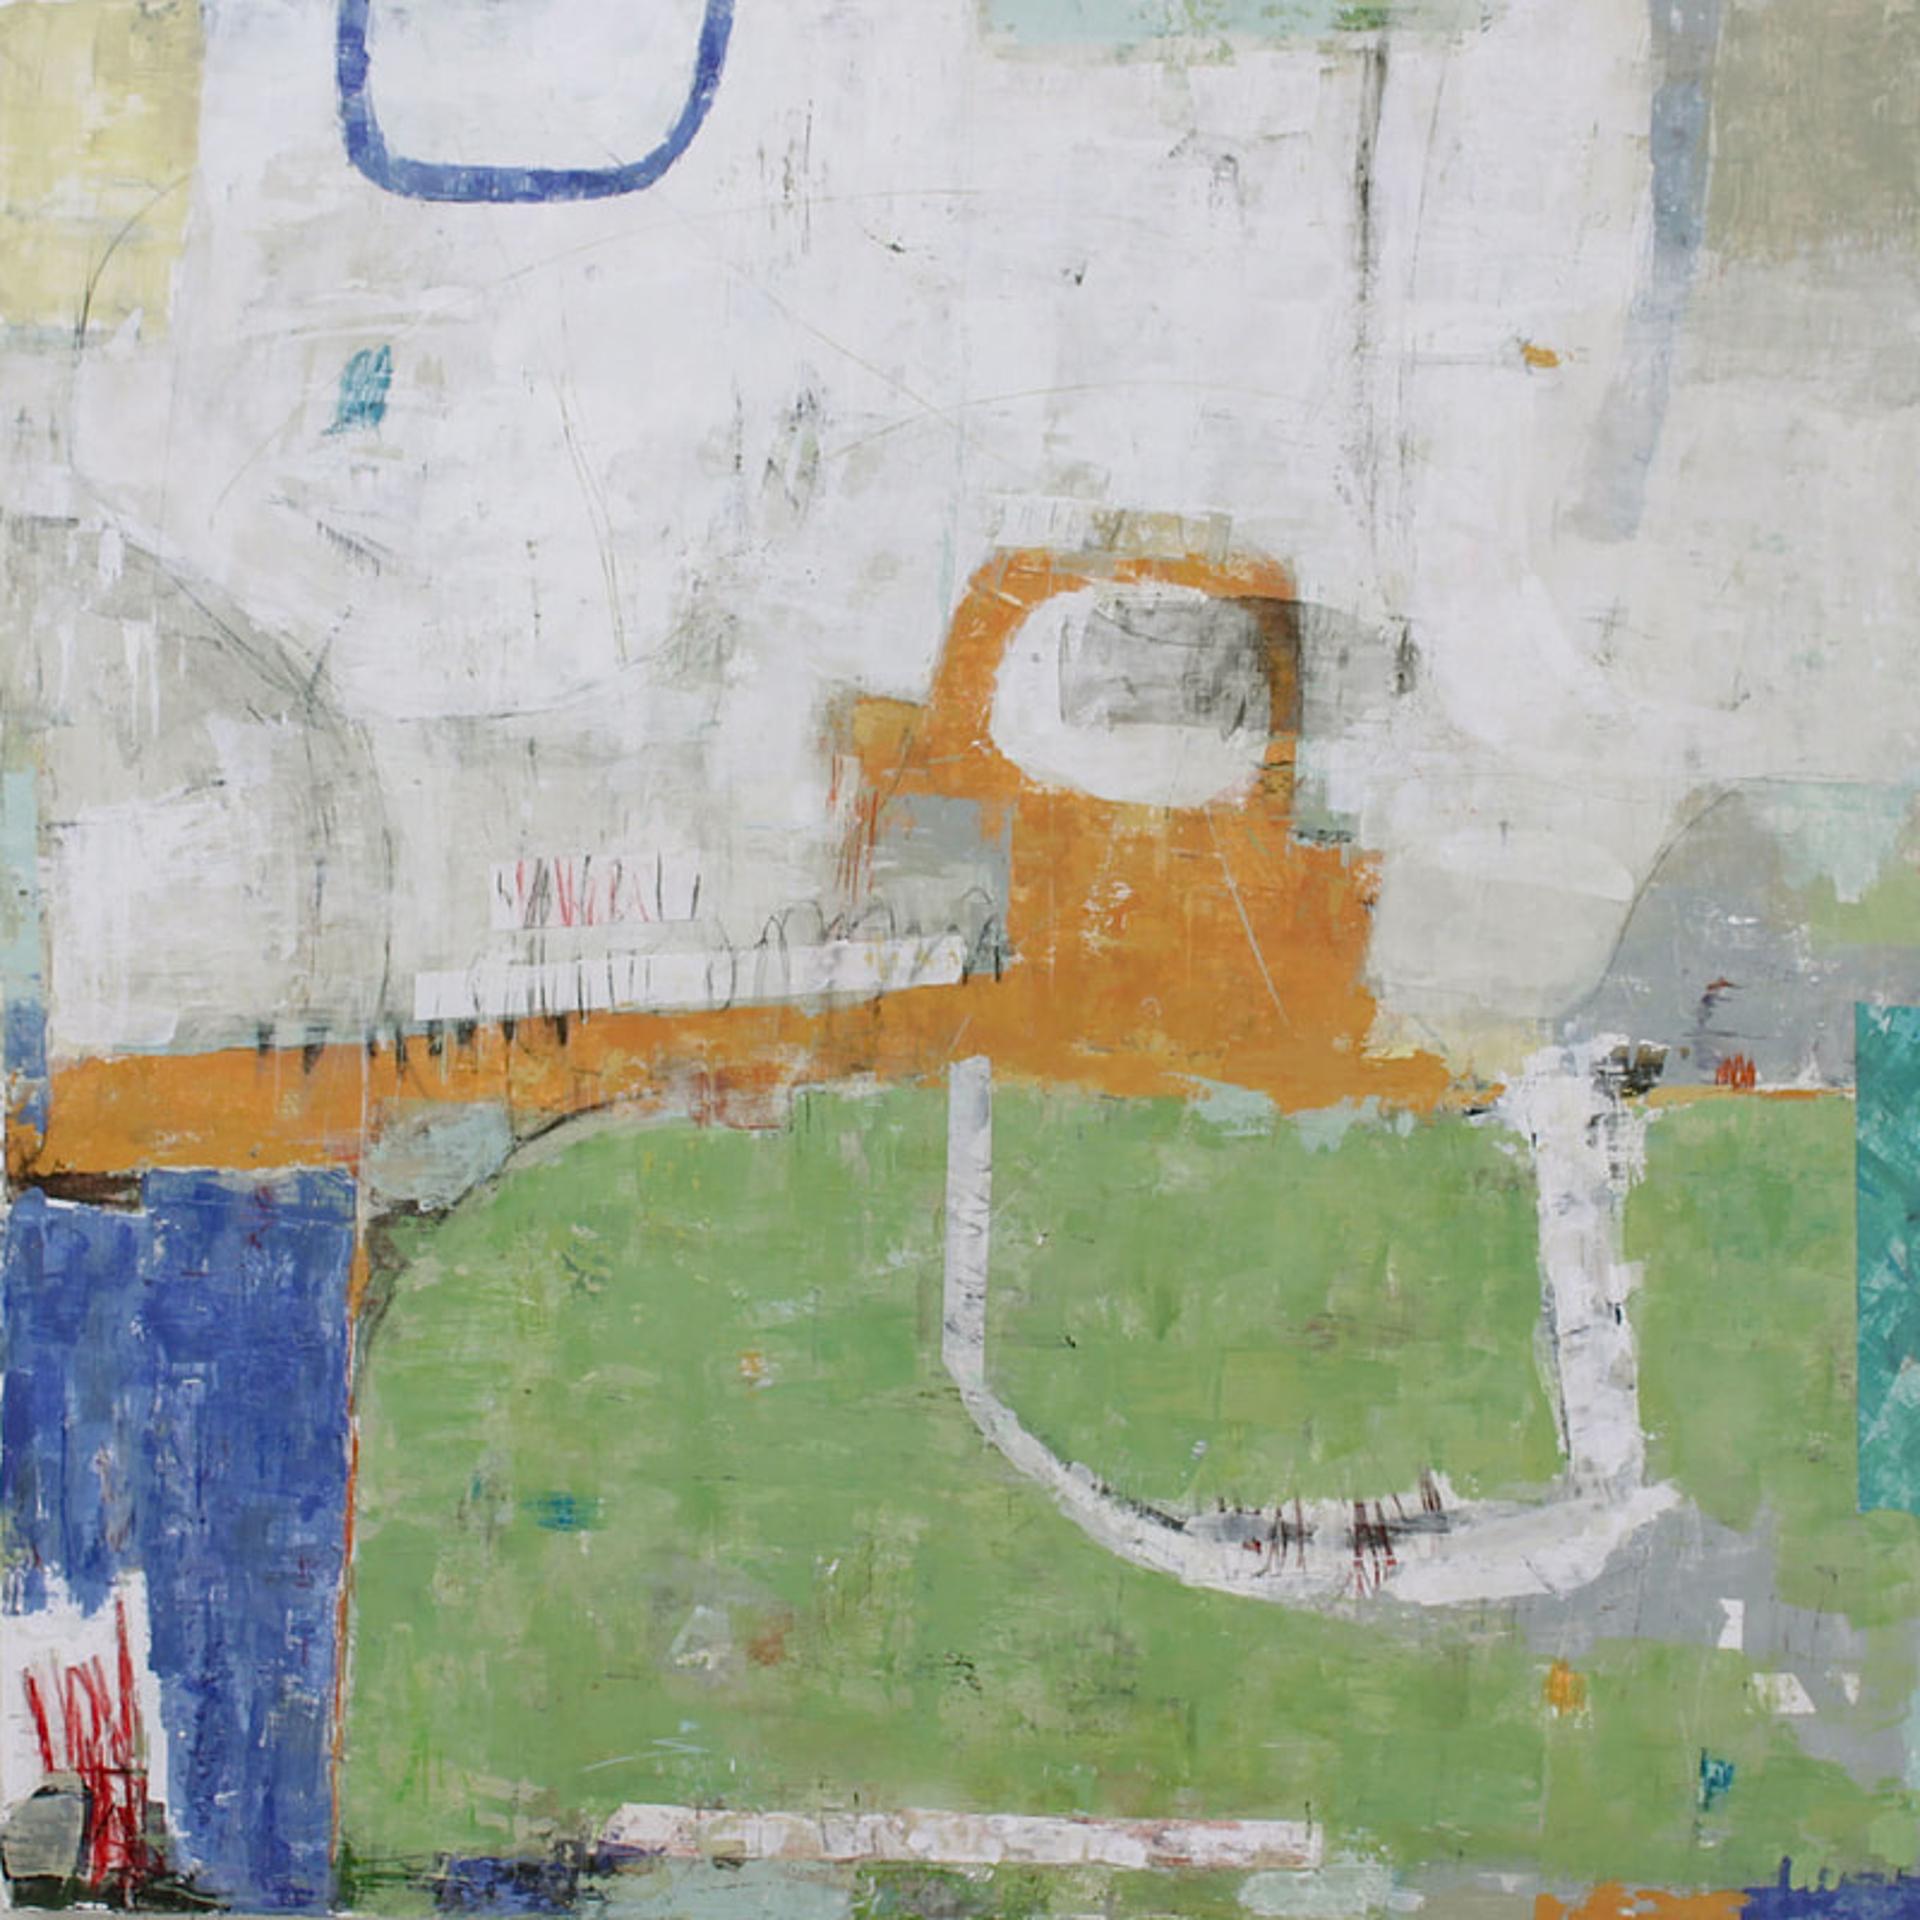 within reach by Paul Brigham